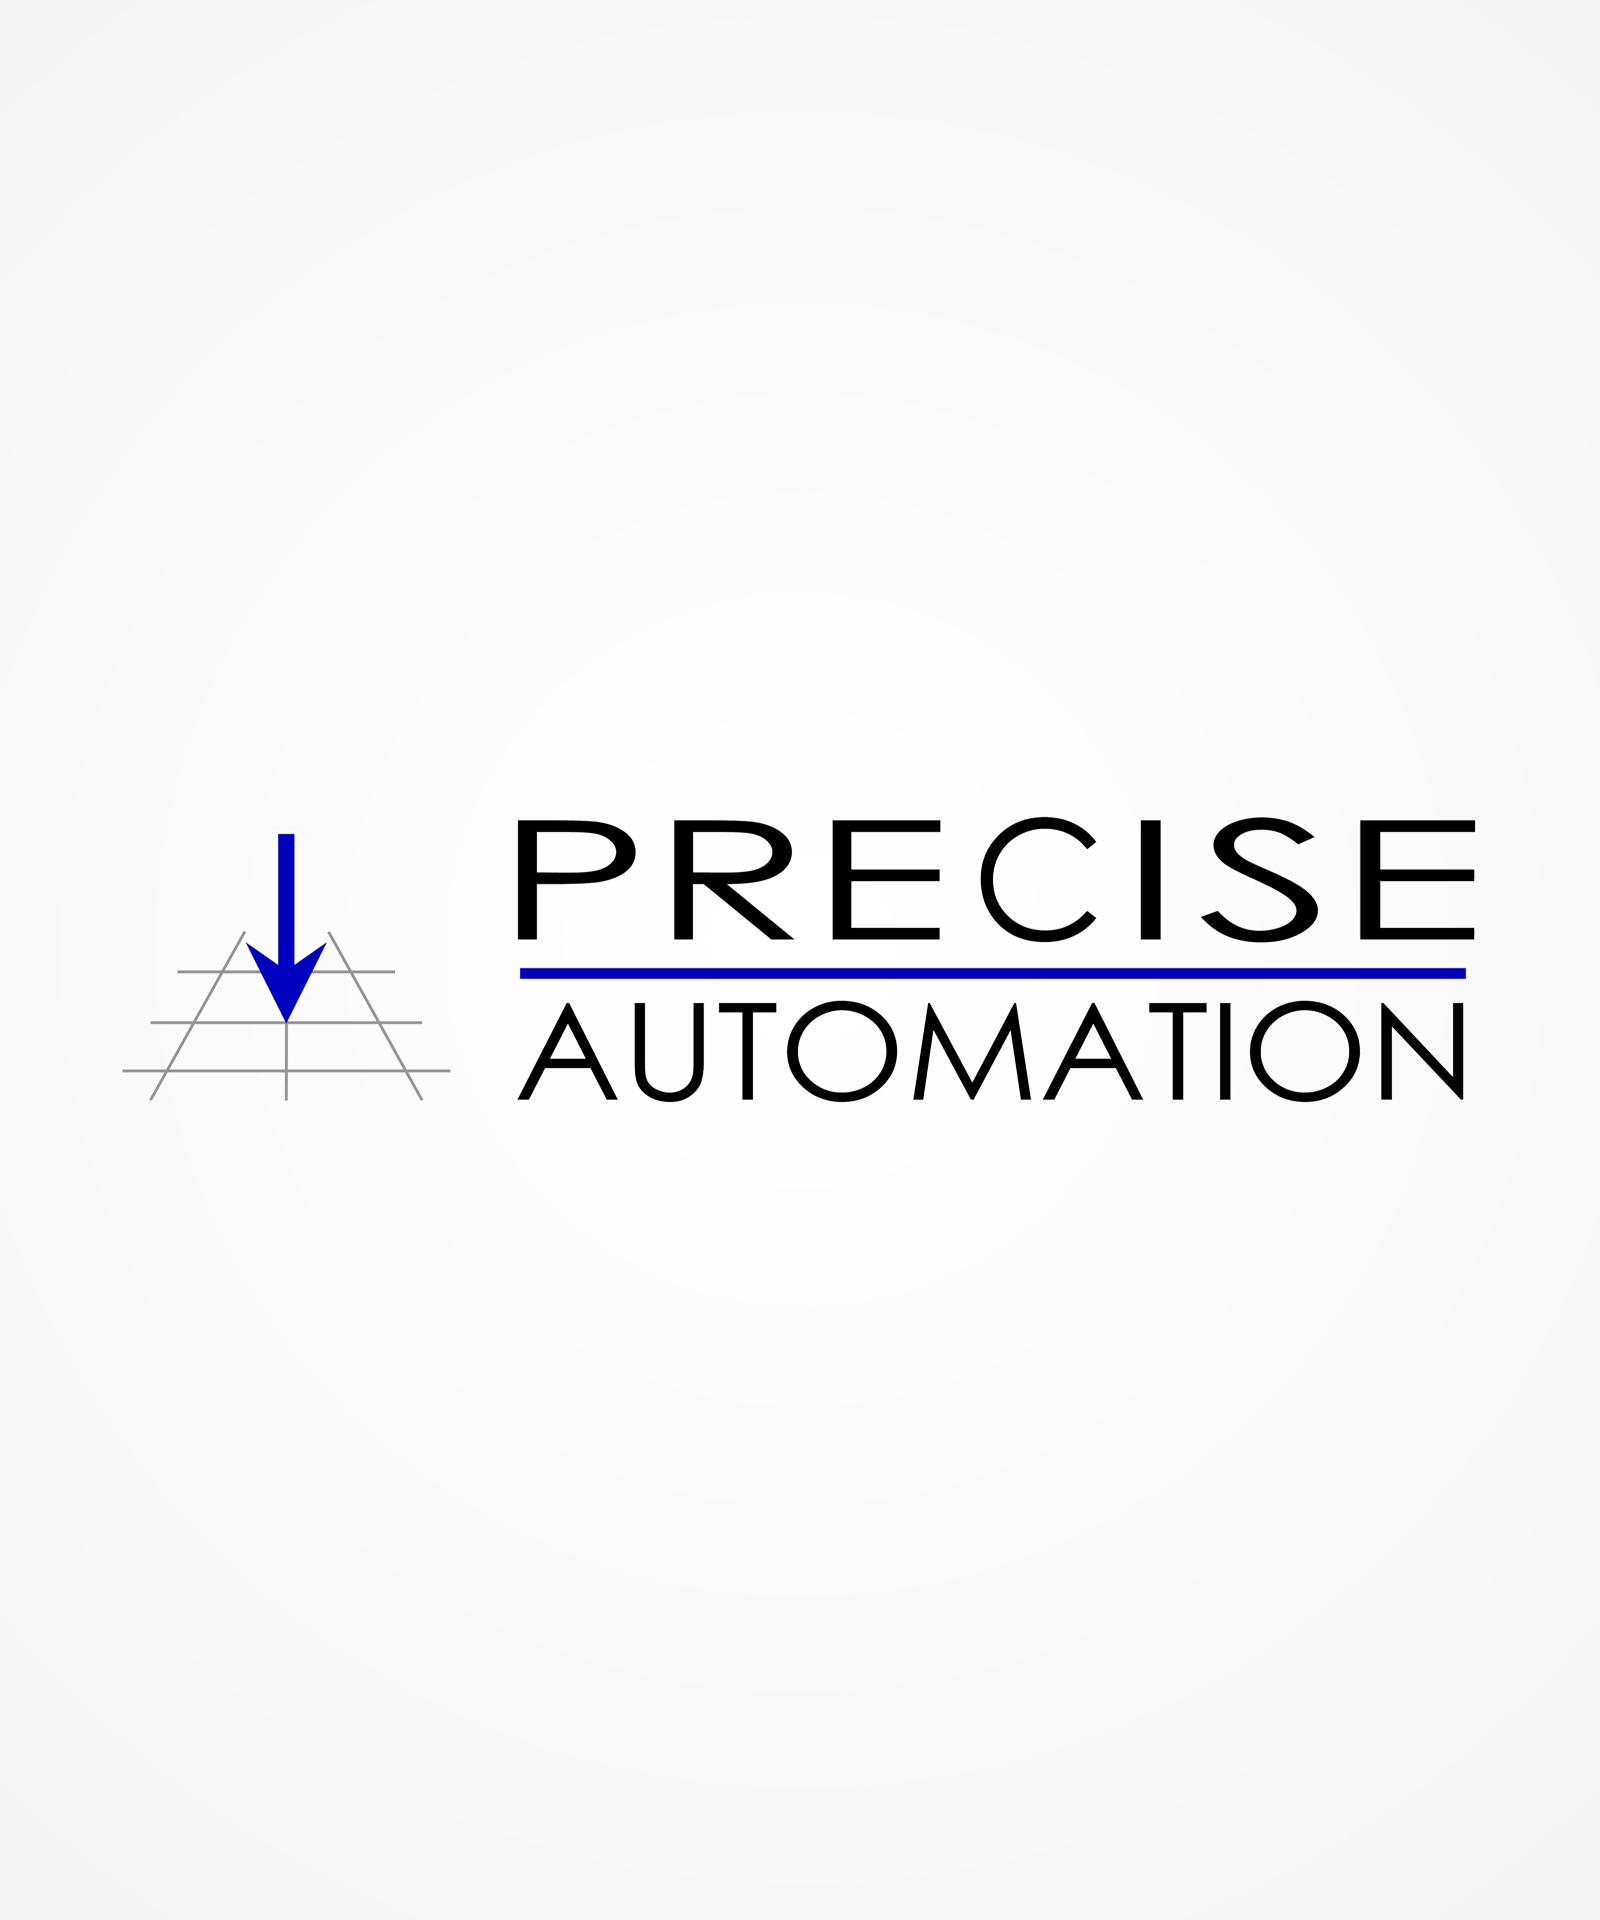 Precise_Automation Logo